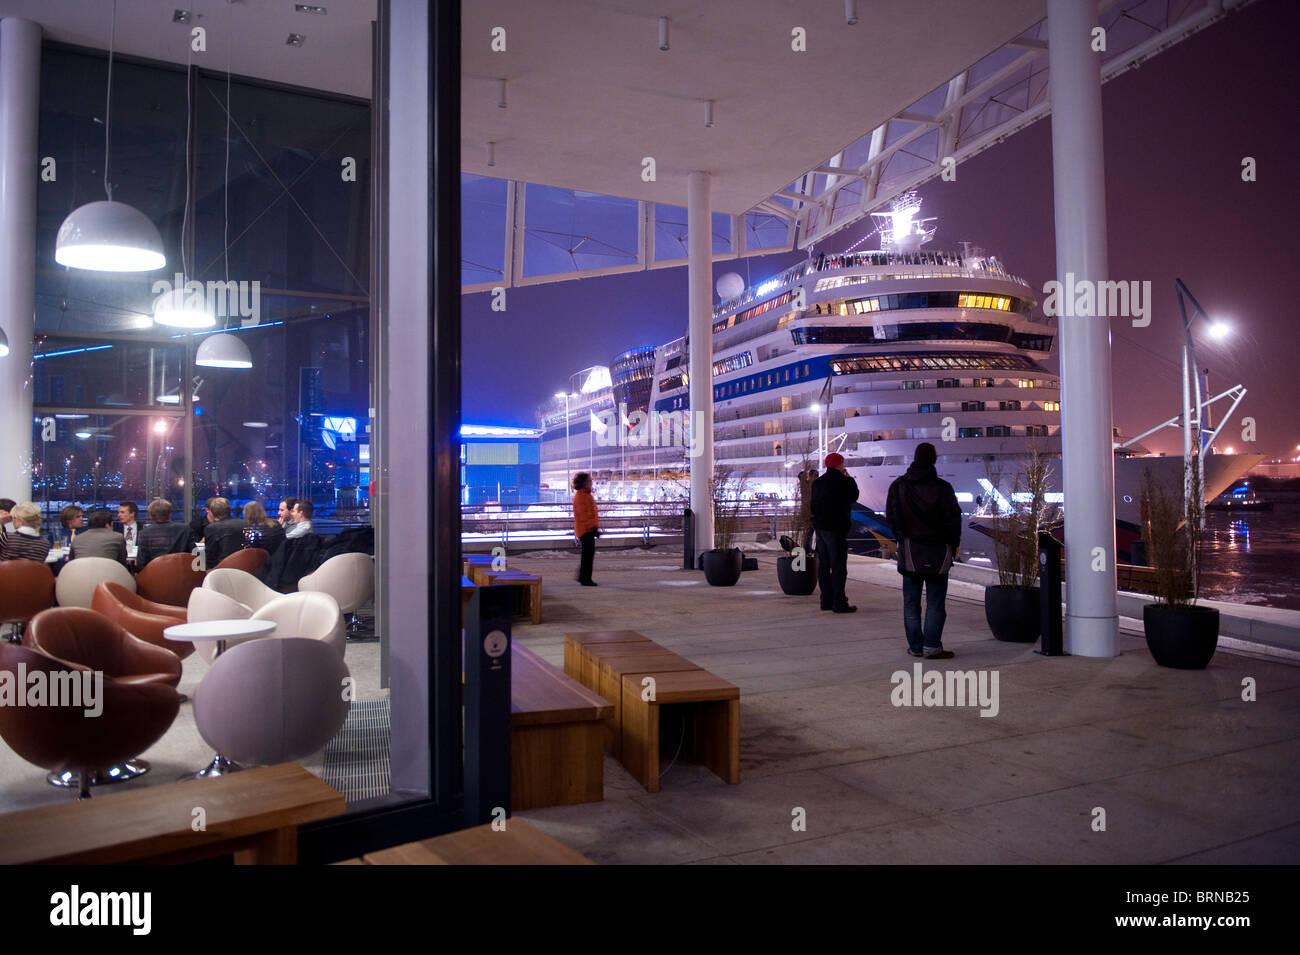 Europe Germany Hamburg, Hafencity , new harbour city , cruising terminal with passenger vessel Aida blu at night - Stock Image